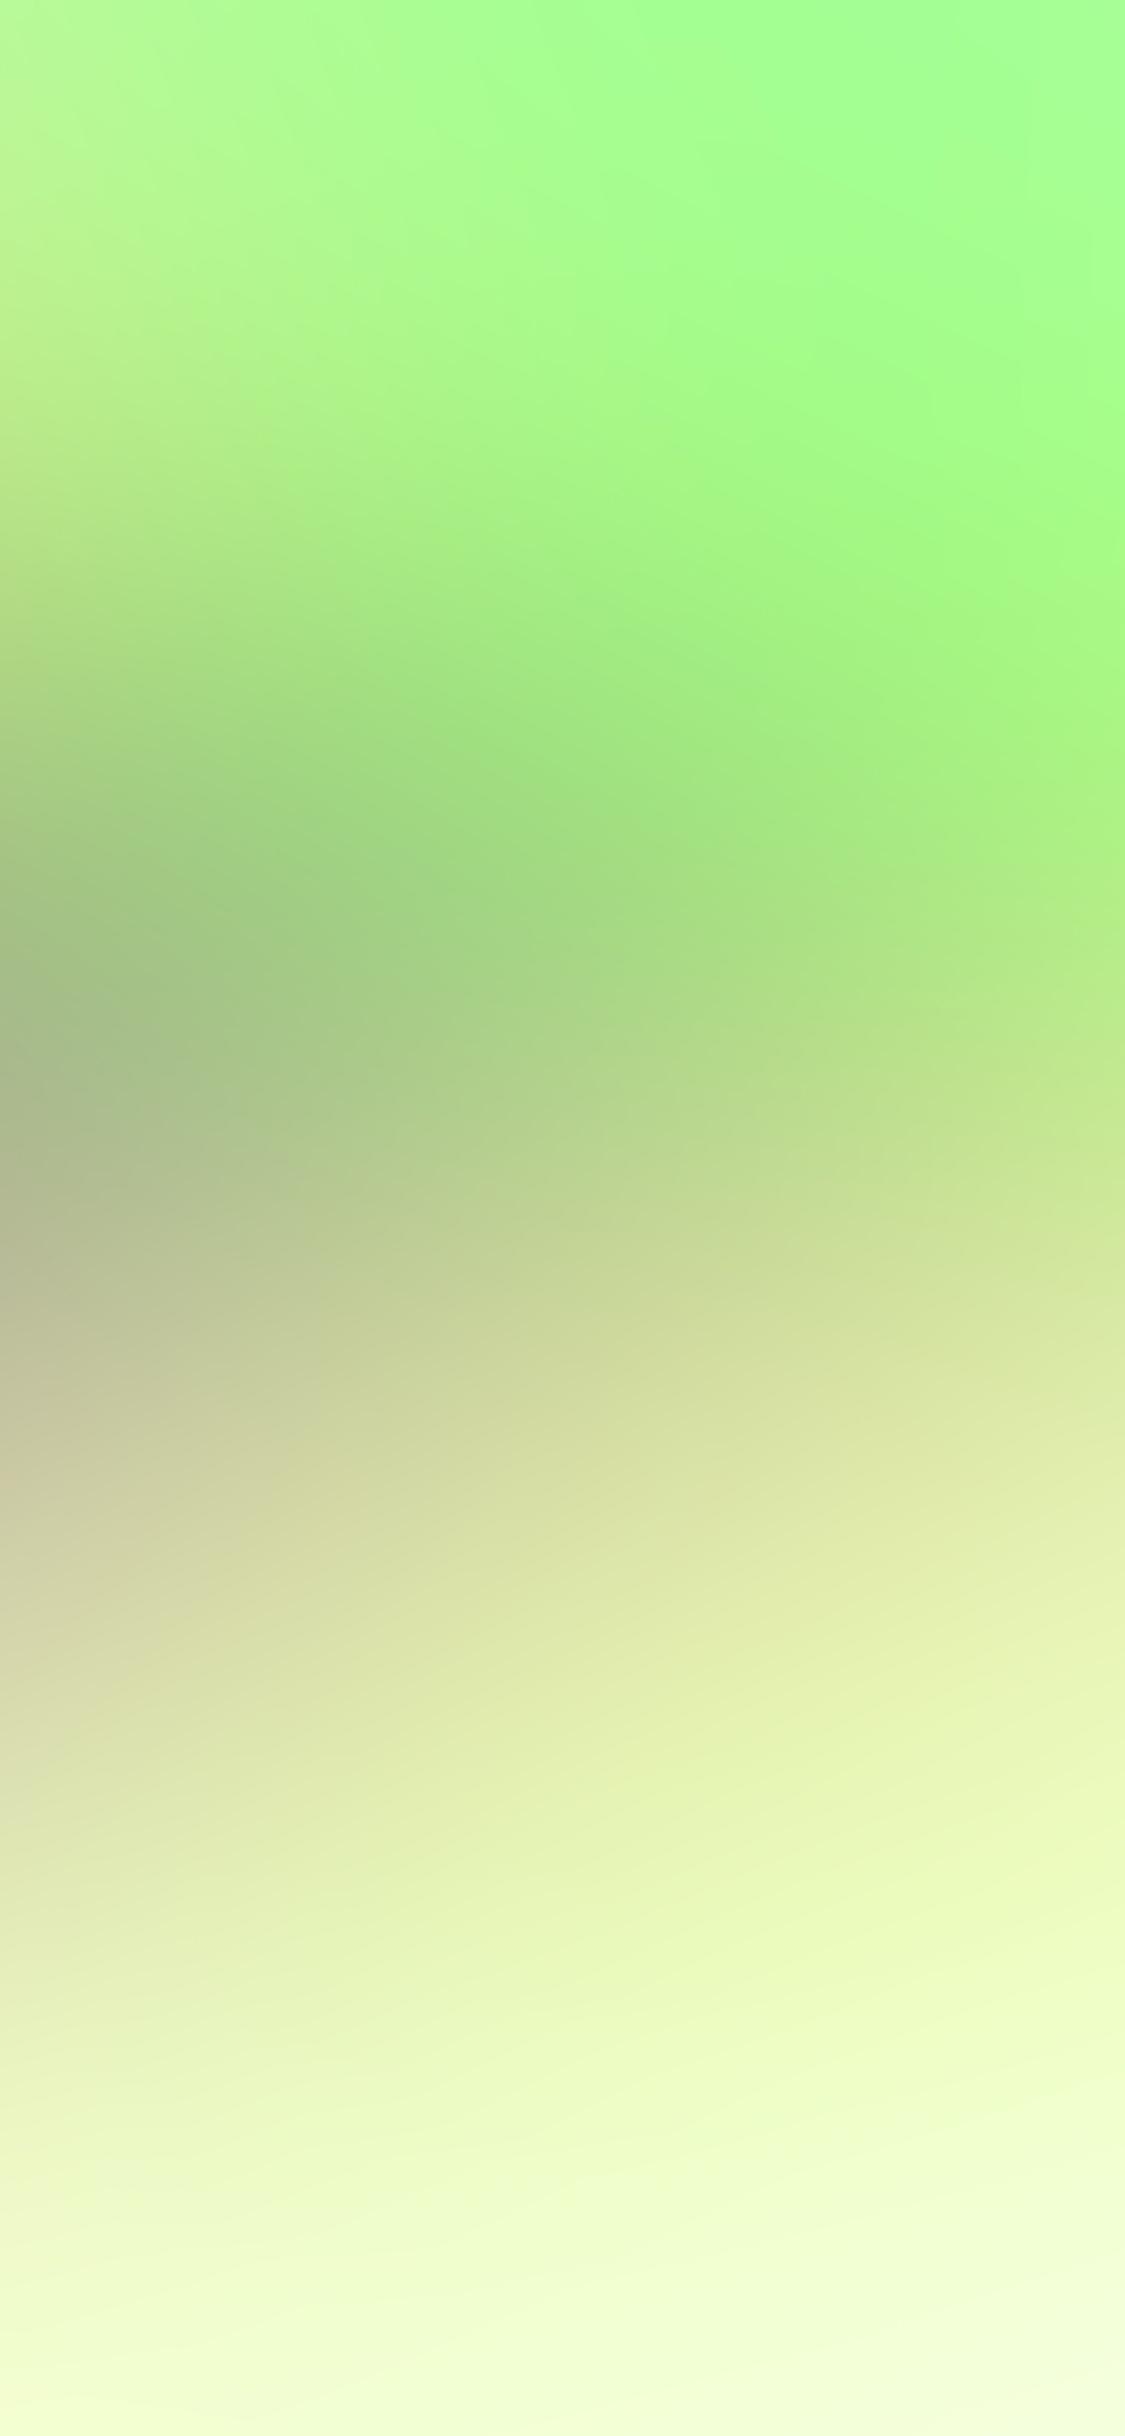 iPhoneXpapers.com-Apple-iPhone-wallpaper-sj15-yellow-cute-green-blur